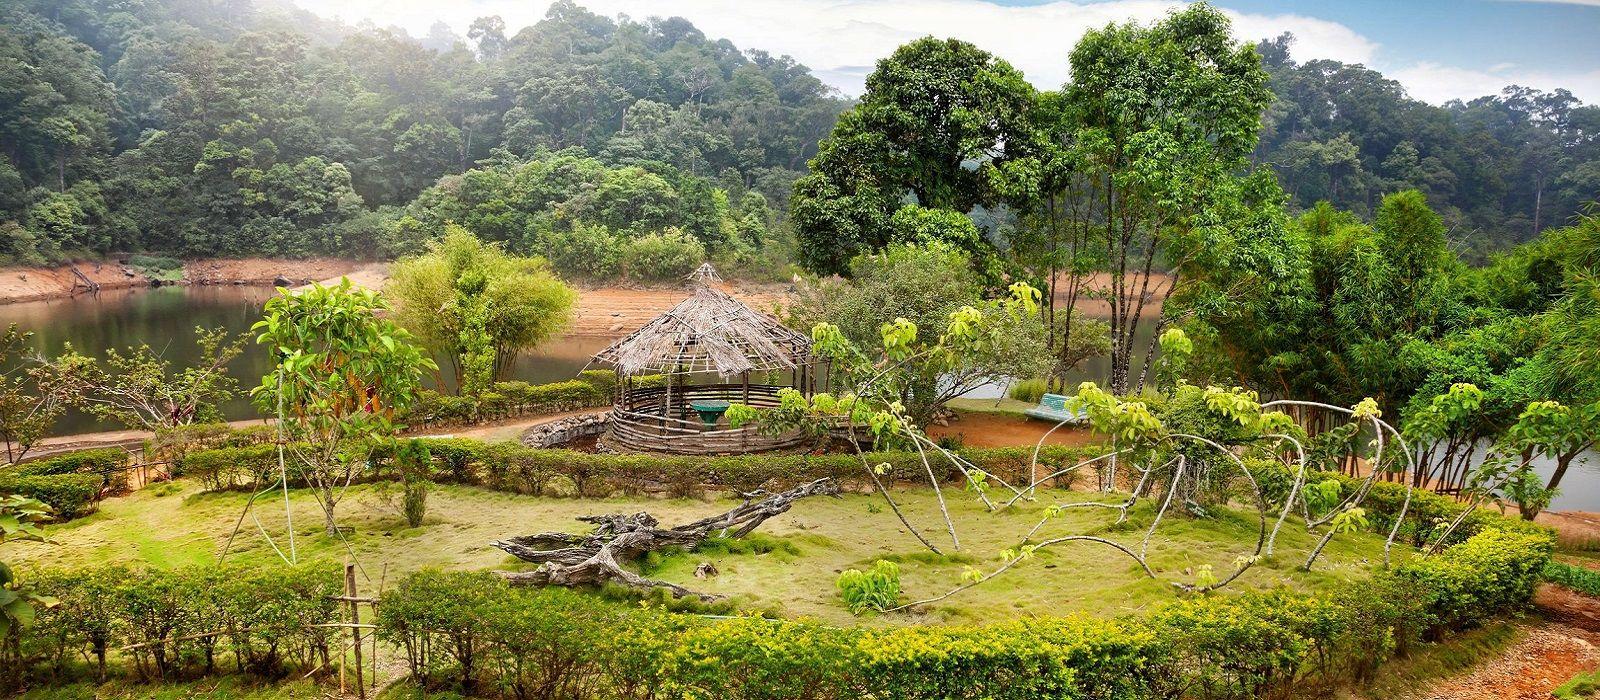 Simply Kerala: Malabar Escapes Tour Trip 6